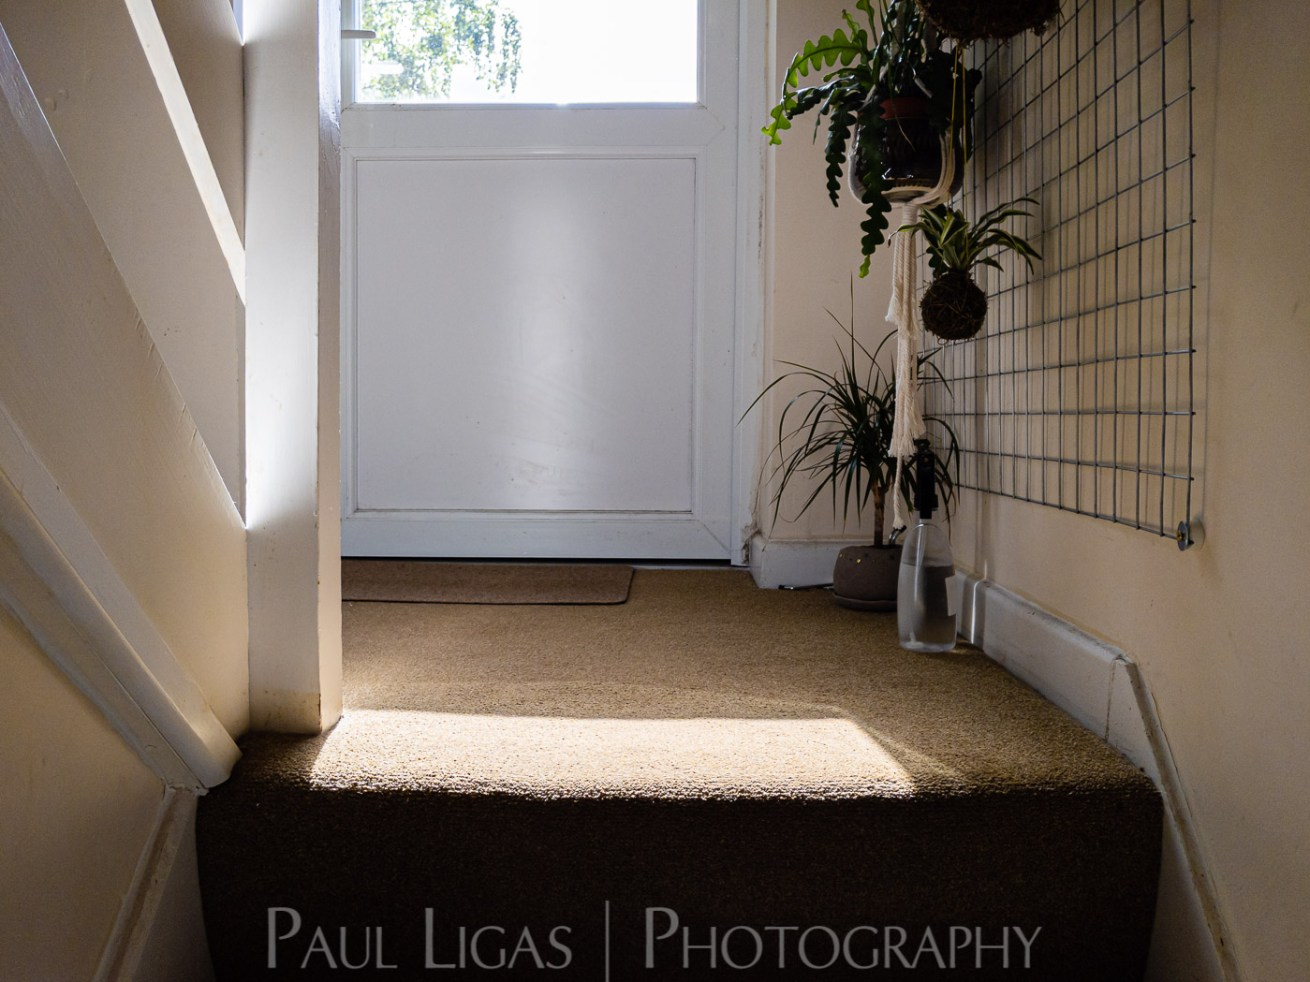 photos from inside a lockdown part 10 paul ligas photography hereford ledbury-160432